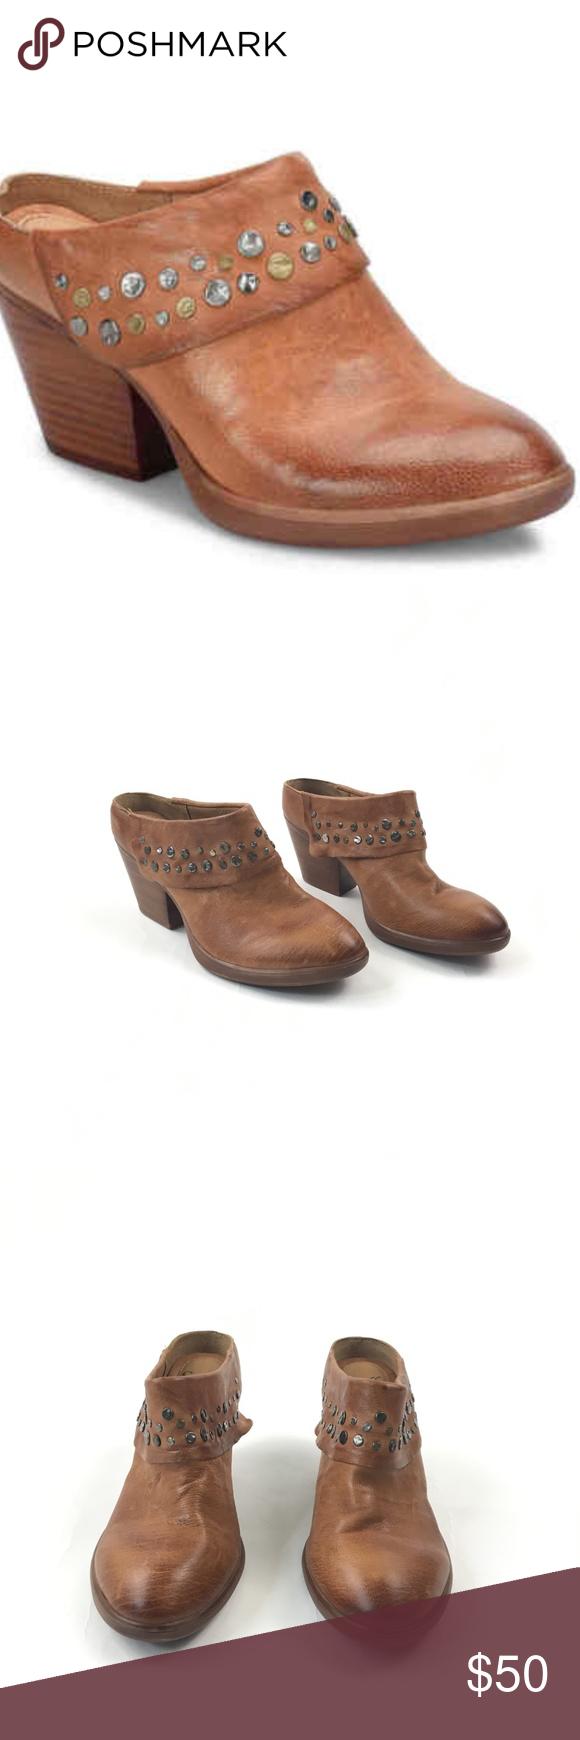 e7aa06739b3407 Sofft Gila Mule Leather Studded Sandal Sofft Gila Mule Brown Leather Studded  Retail Price   99.99